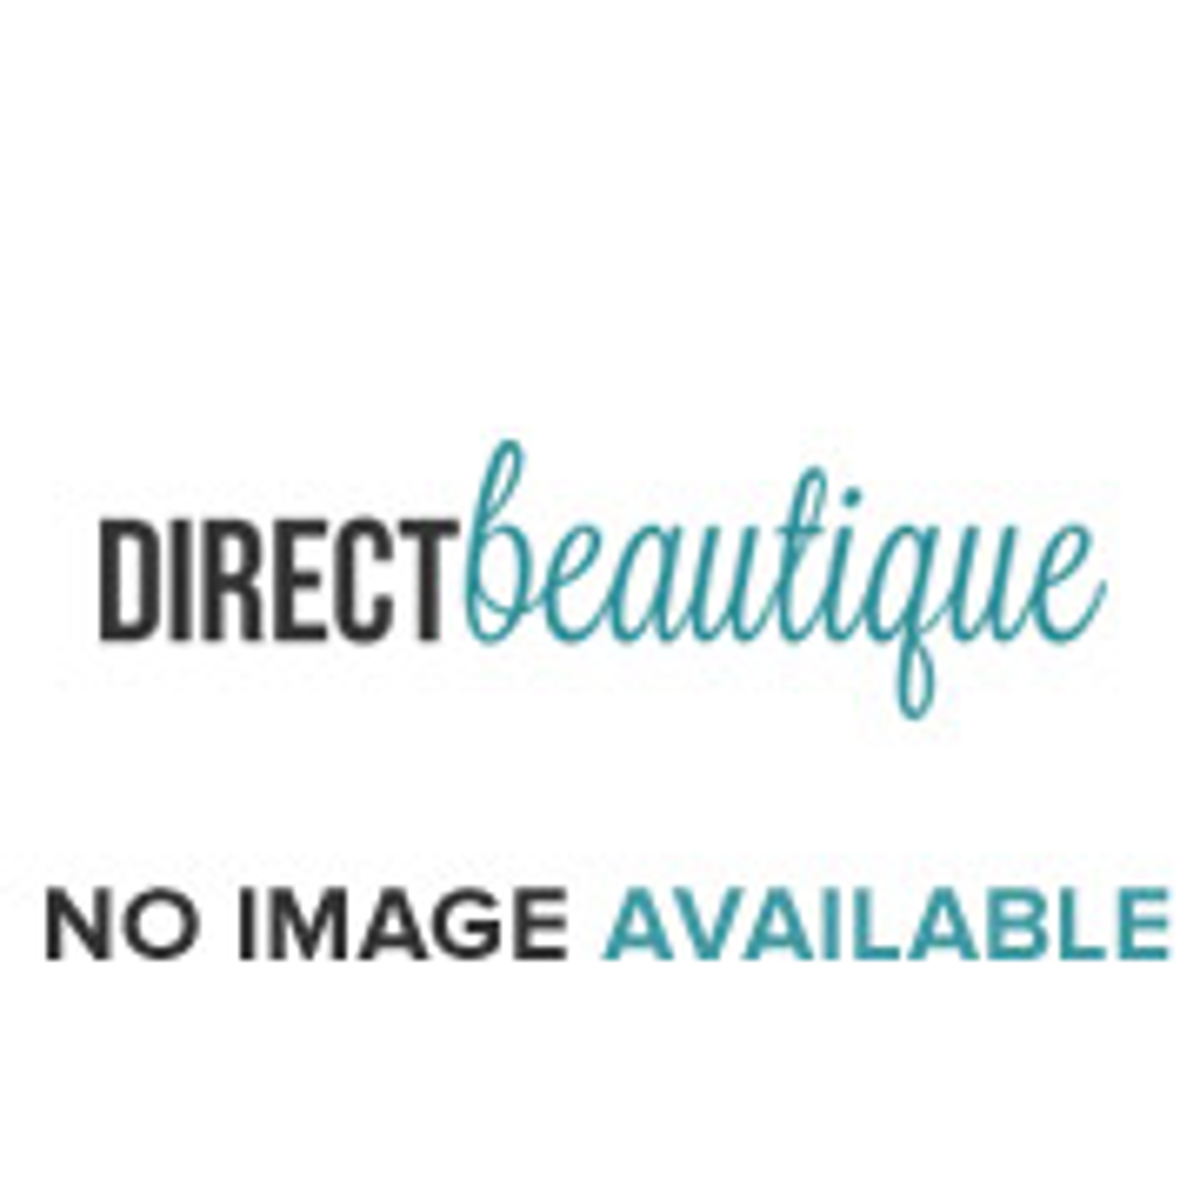 Clarins Face Treatment Oil Santal Dry/Extra Dry Skin 30ml